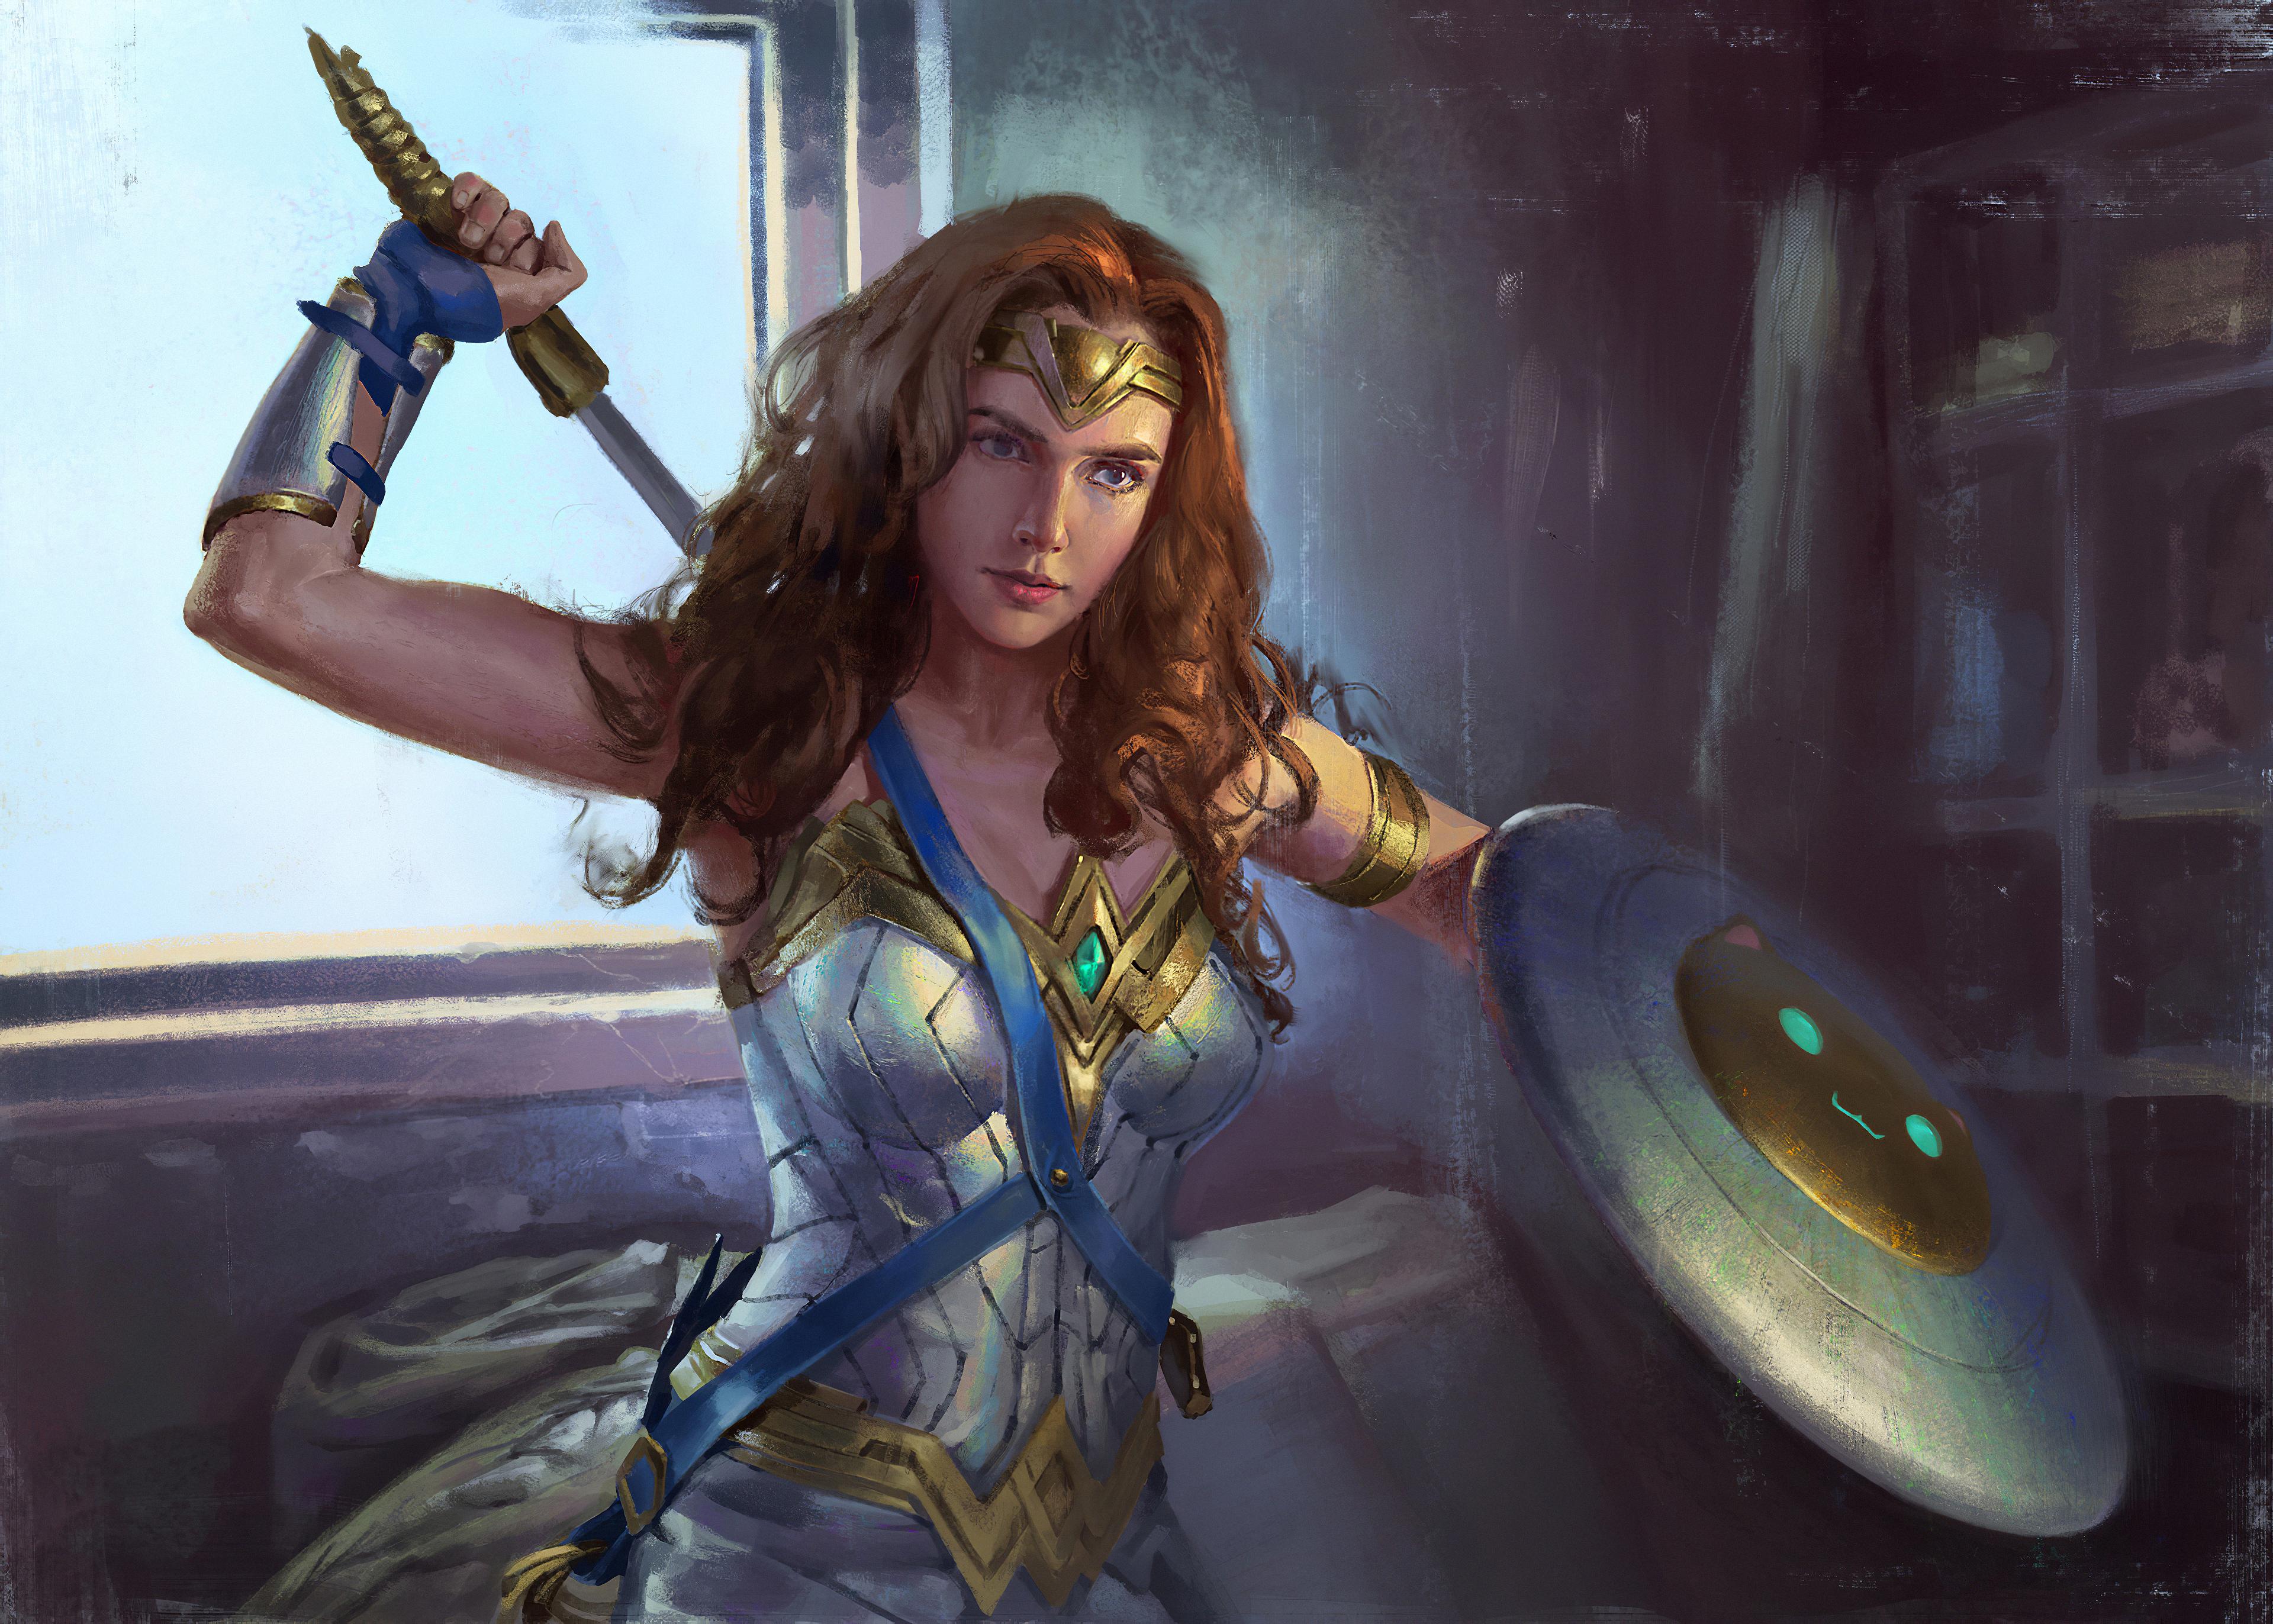 wonder woman art 1576093342 - Wonder Woman Art - wonder woman wallpaper phone hd 4k, Wonder Woman wallpaper 4k hd, wonder woman art wallpaper 4k, wonder woman 4k wallpaper